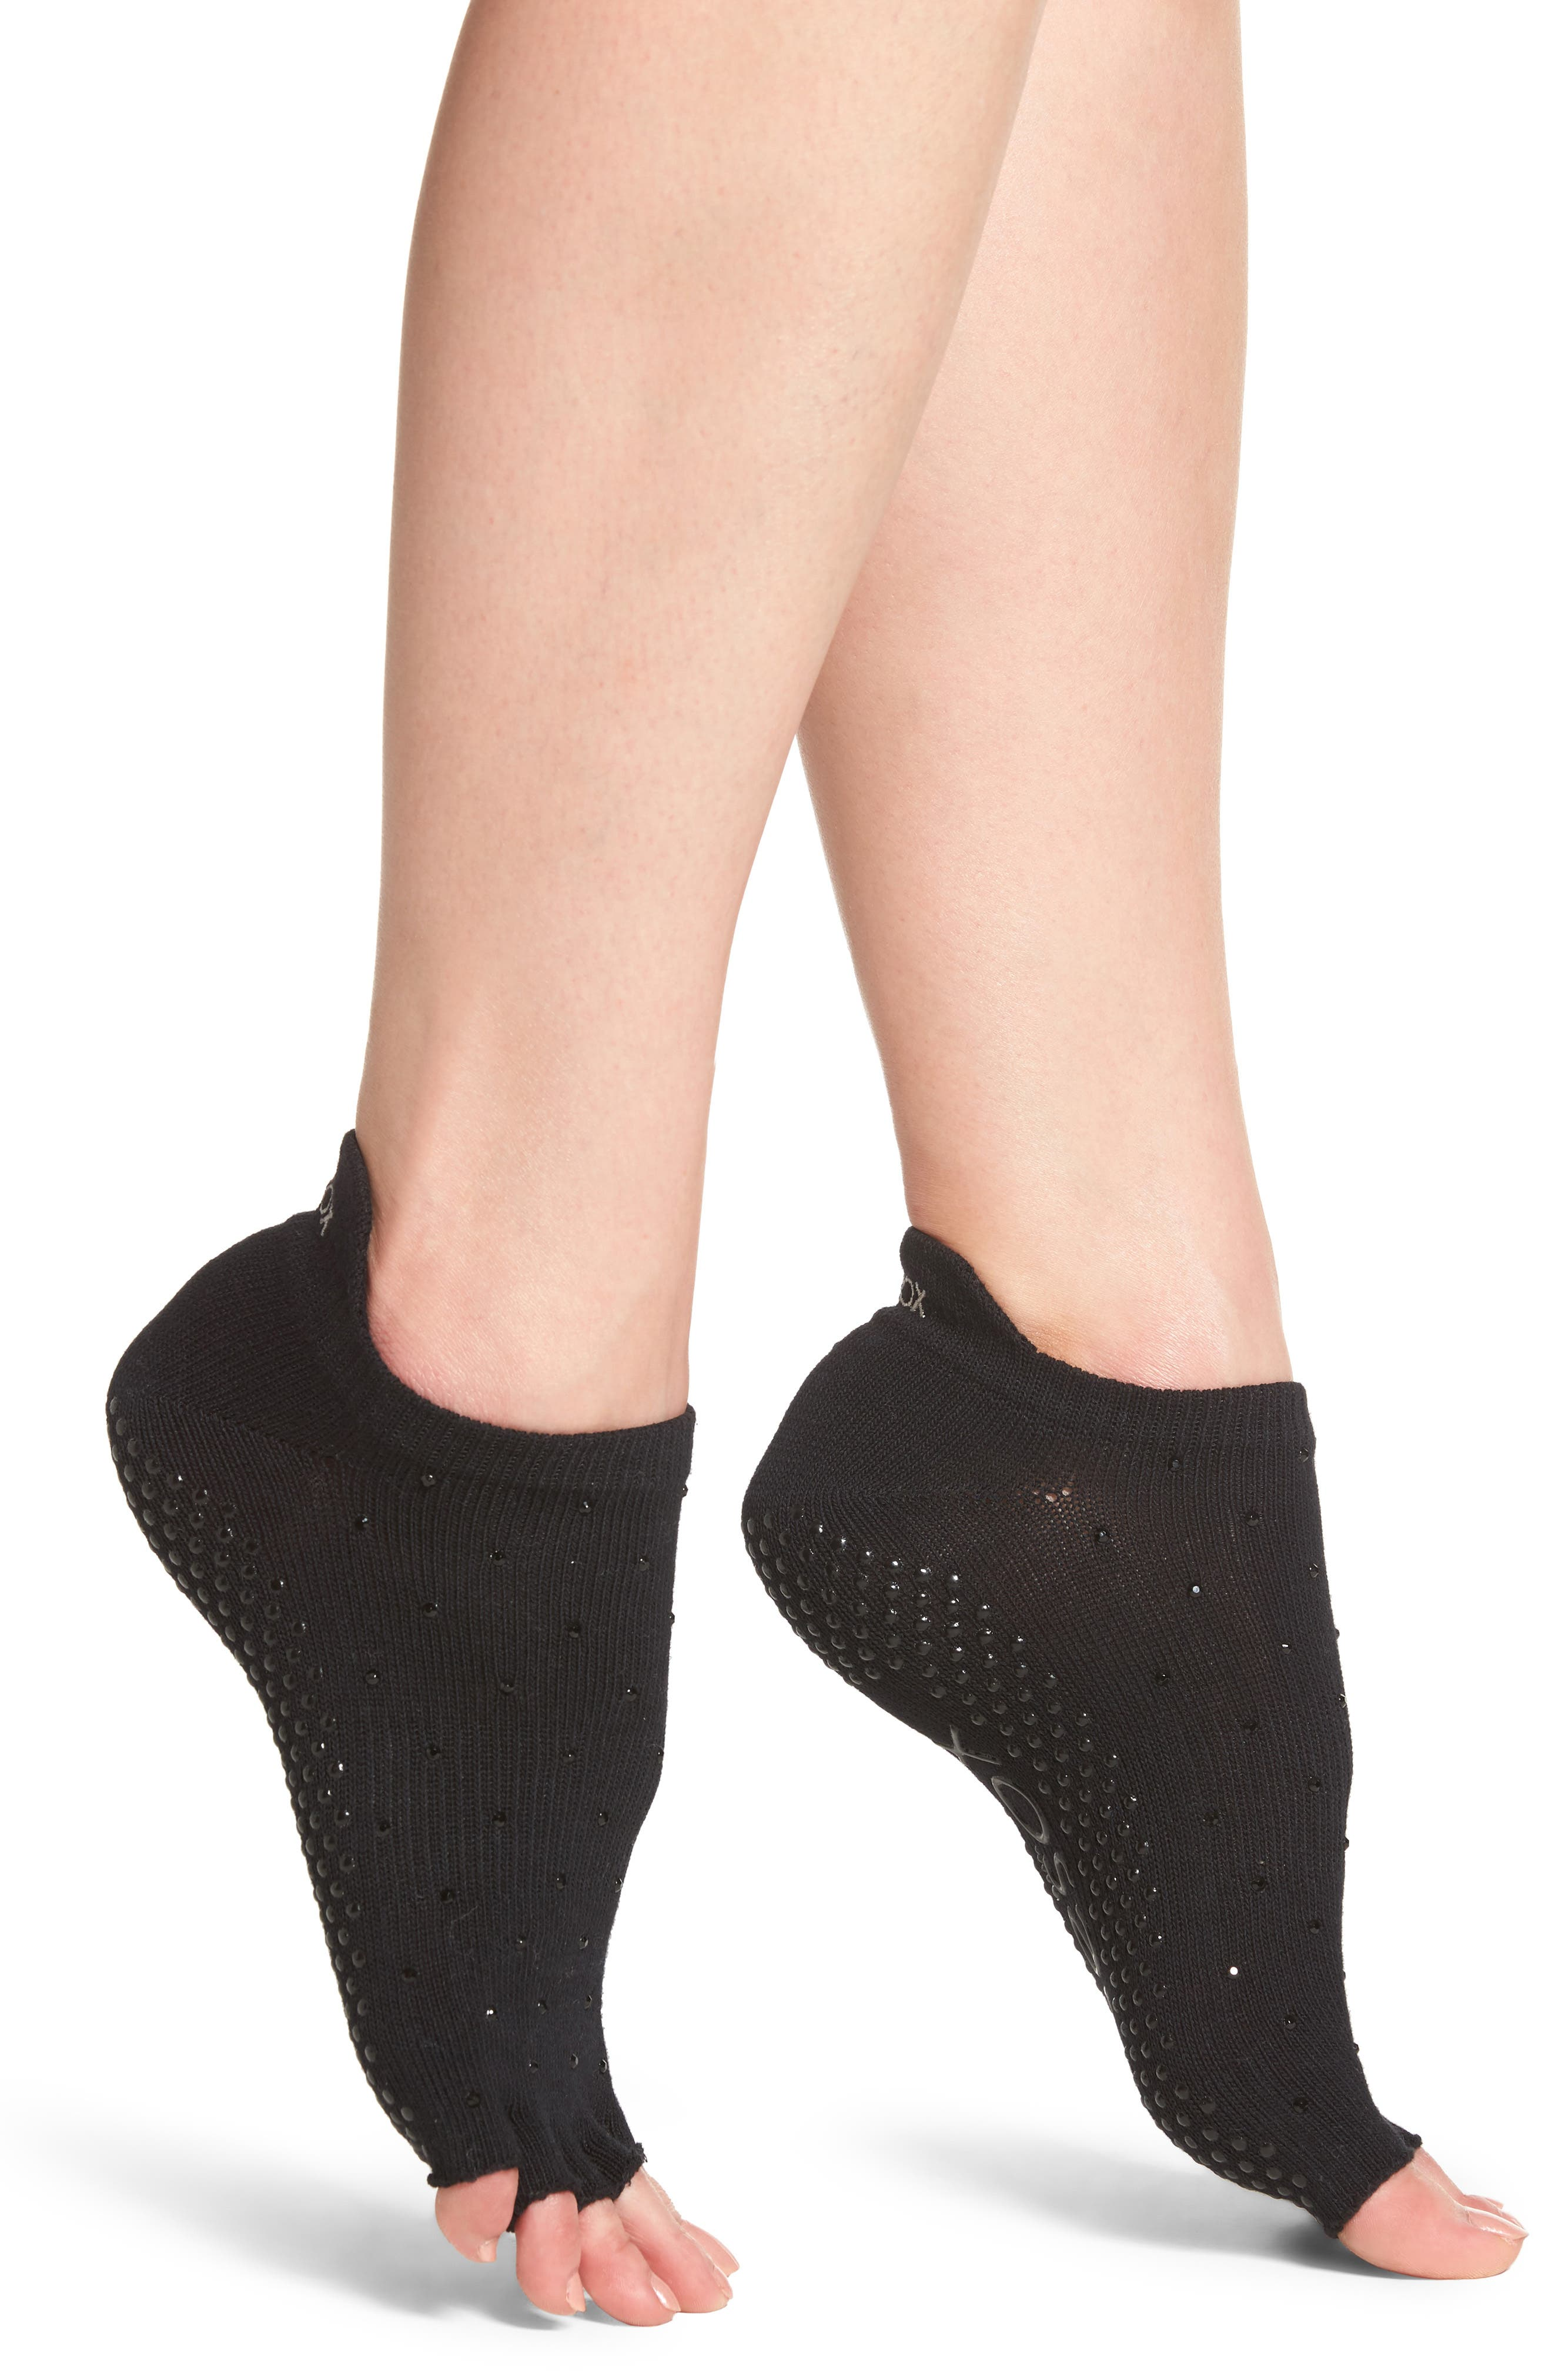 Half Toe Low Rise Grip Socks,                             Main thumbnail 1, color,                             001